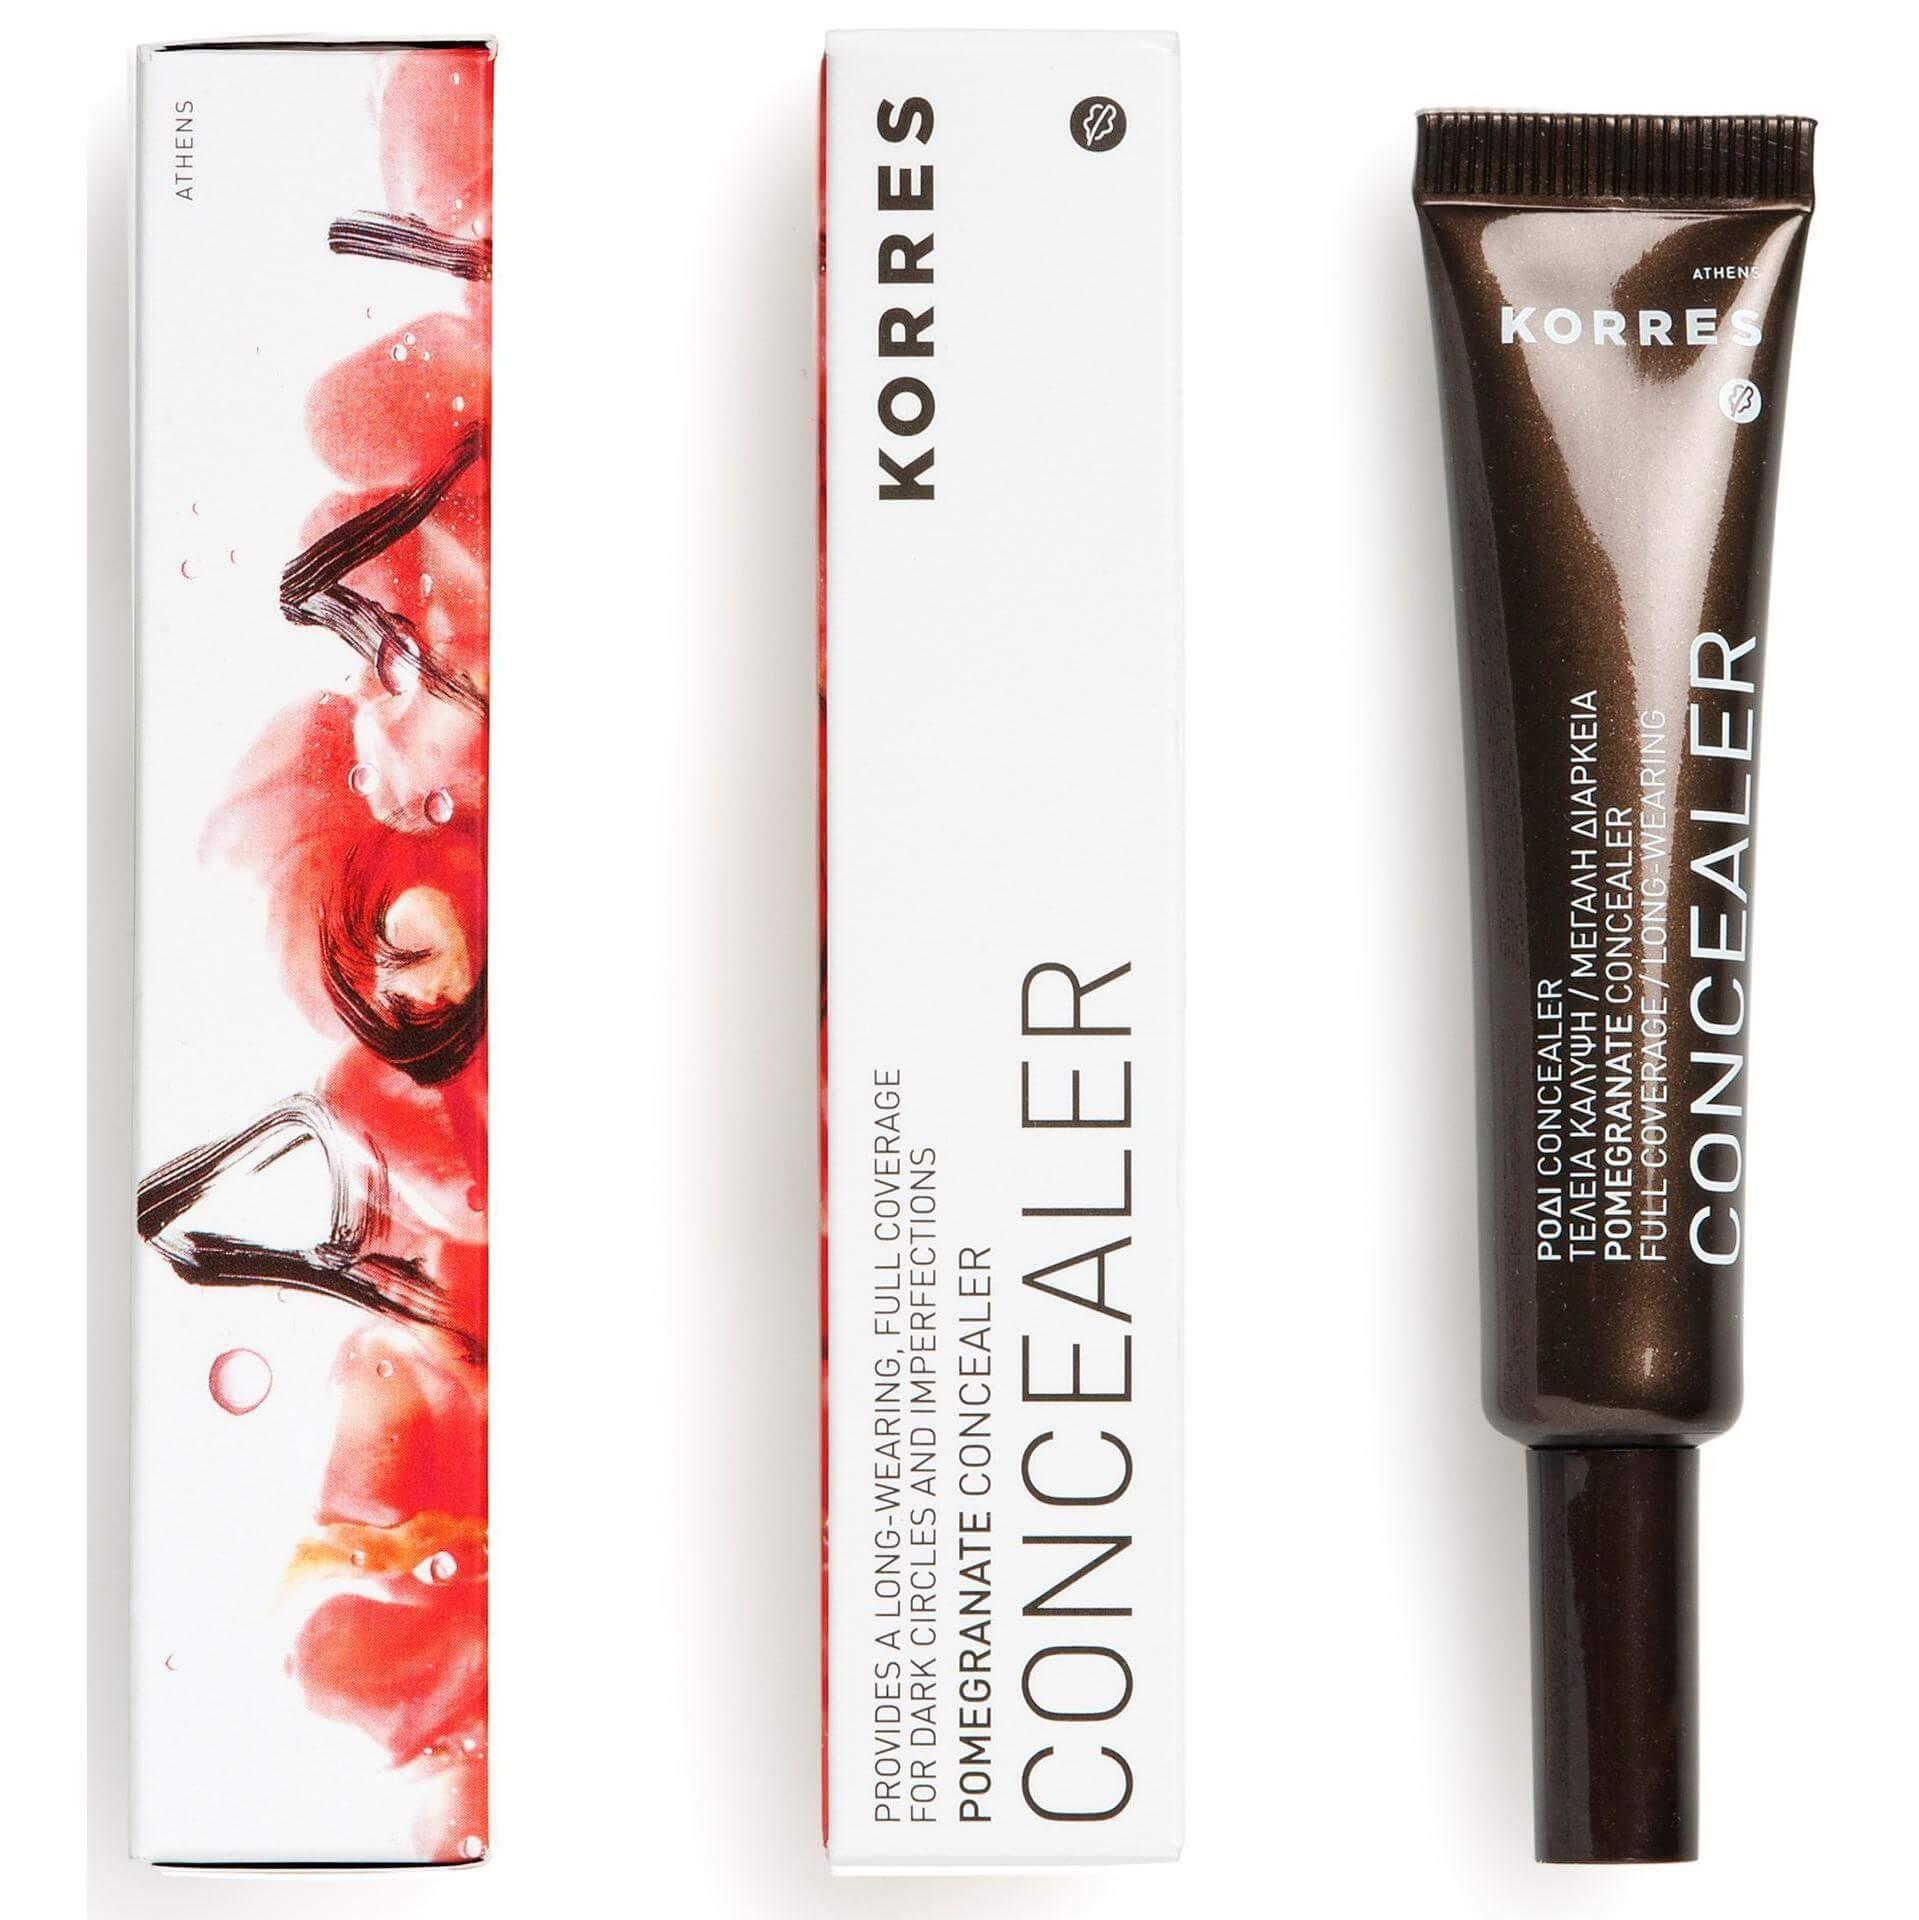 Korres Pomegranate/Ρόδι Concealer Μαύροι Κύκλοι / Ατέλειες 10ml – PC1